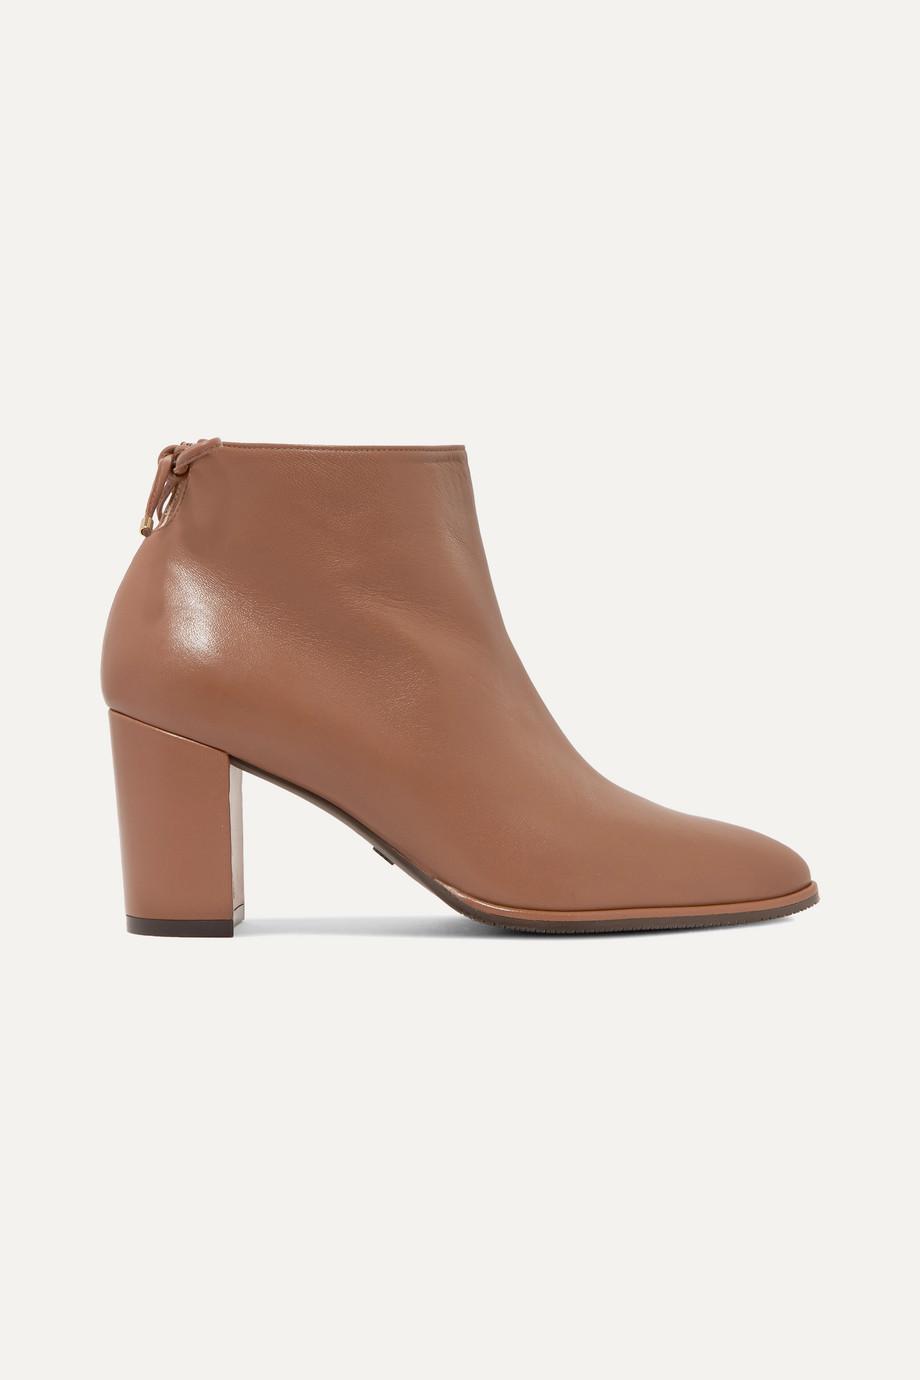 Stuart Weitzman Gardiner leather ankle boots